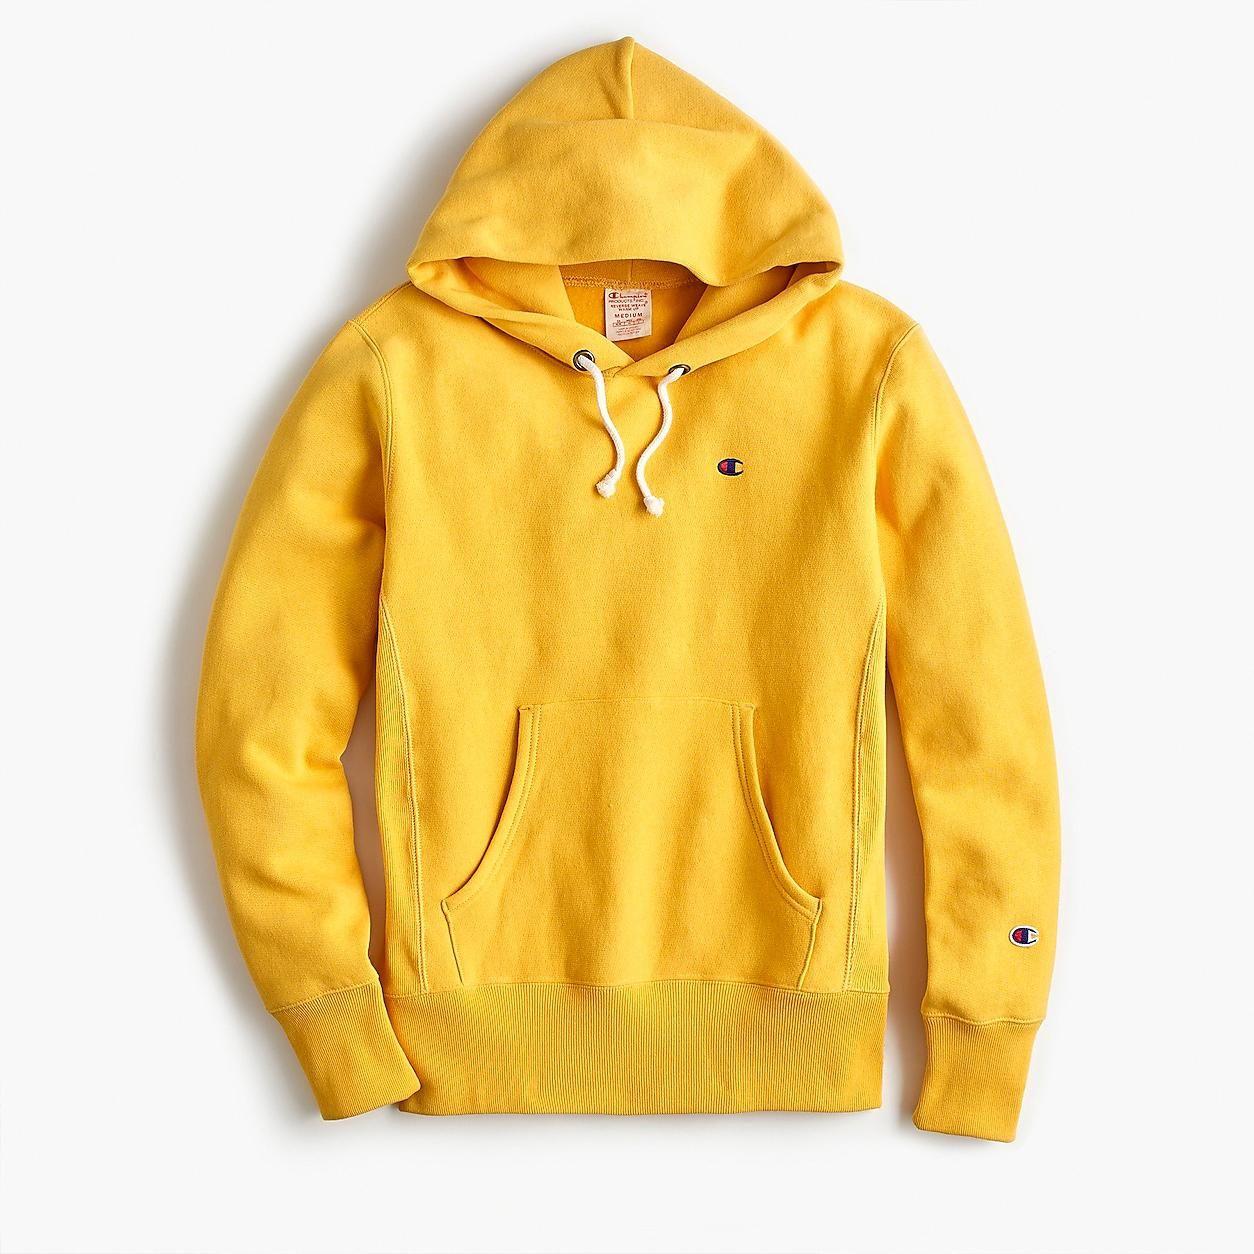 Raincoats For Women Shape Womensraincoatbigw Code 1249273007 Versaliswomensraincoat Champion Hoodie Women Sweatshirts Sweatshirts Hoodie [ 1254 x 1254 Pixel ]